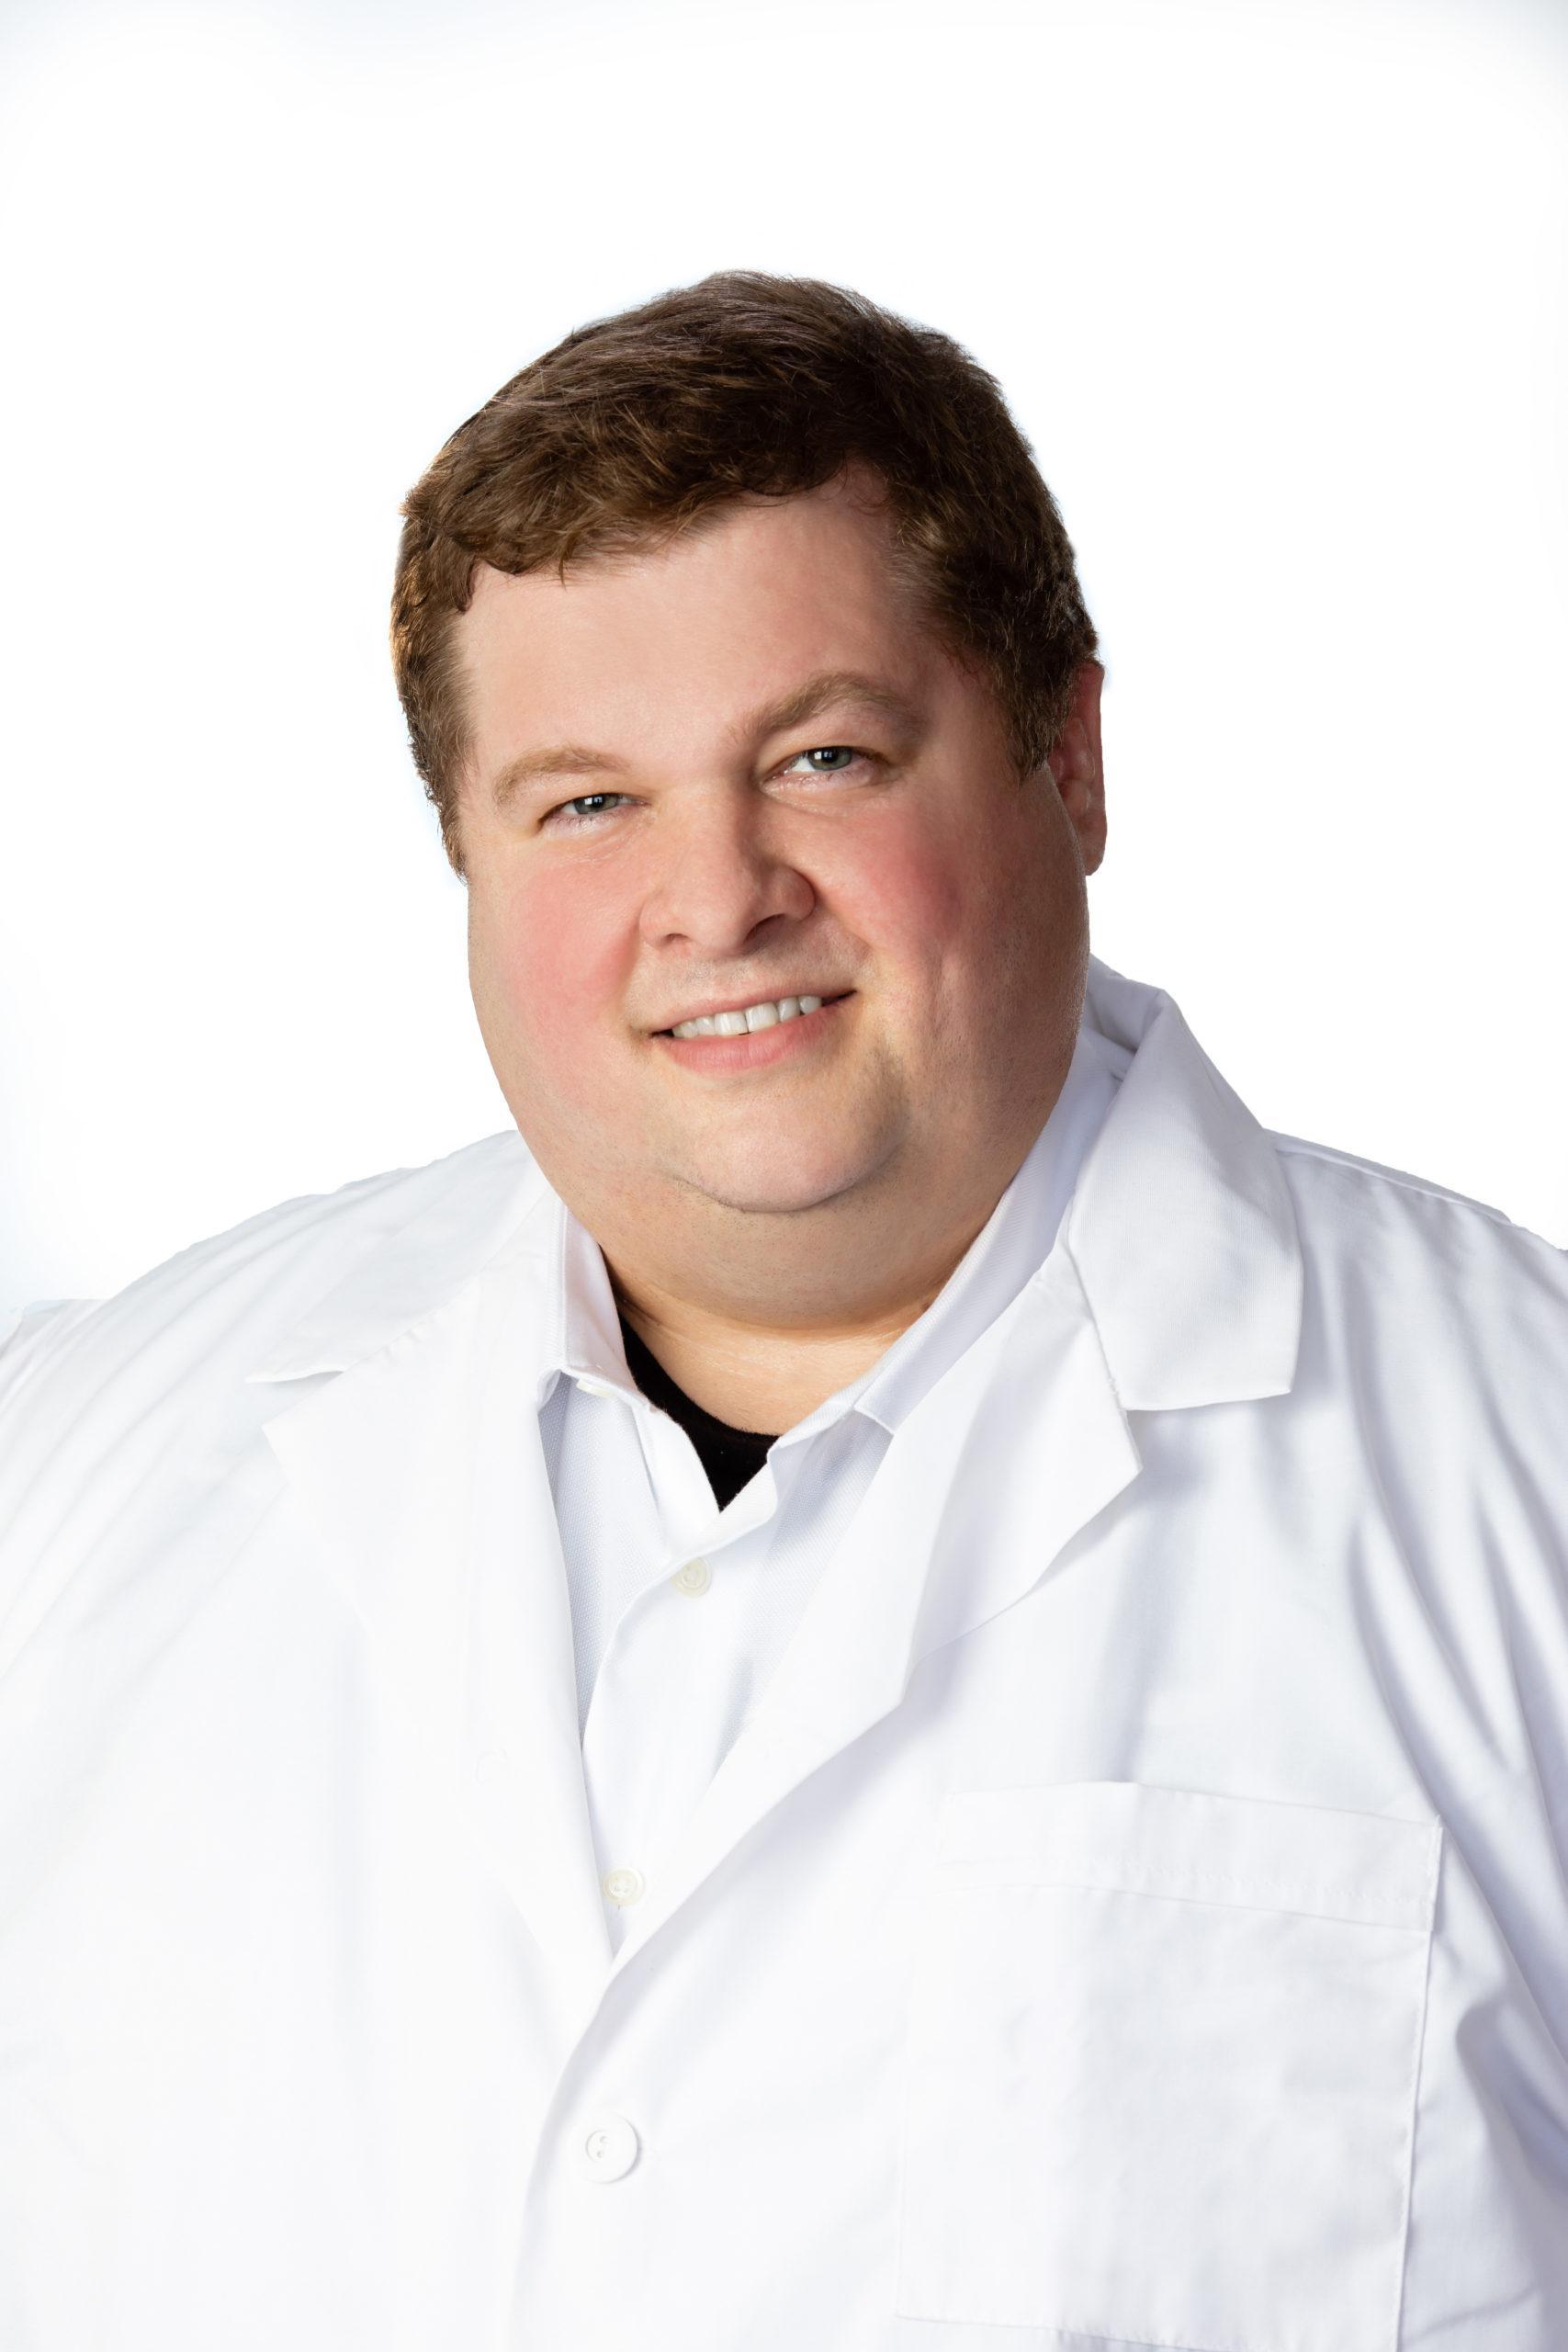 Jonathan K Jones, MD